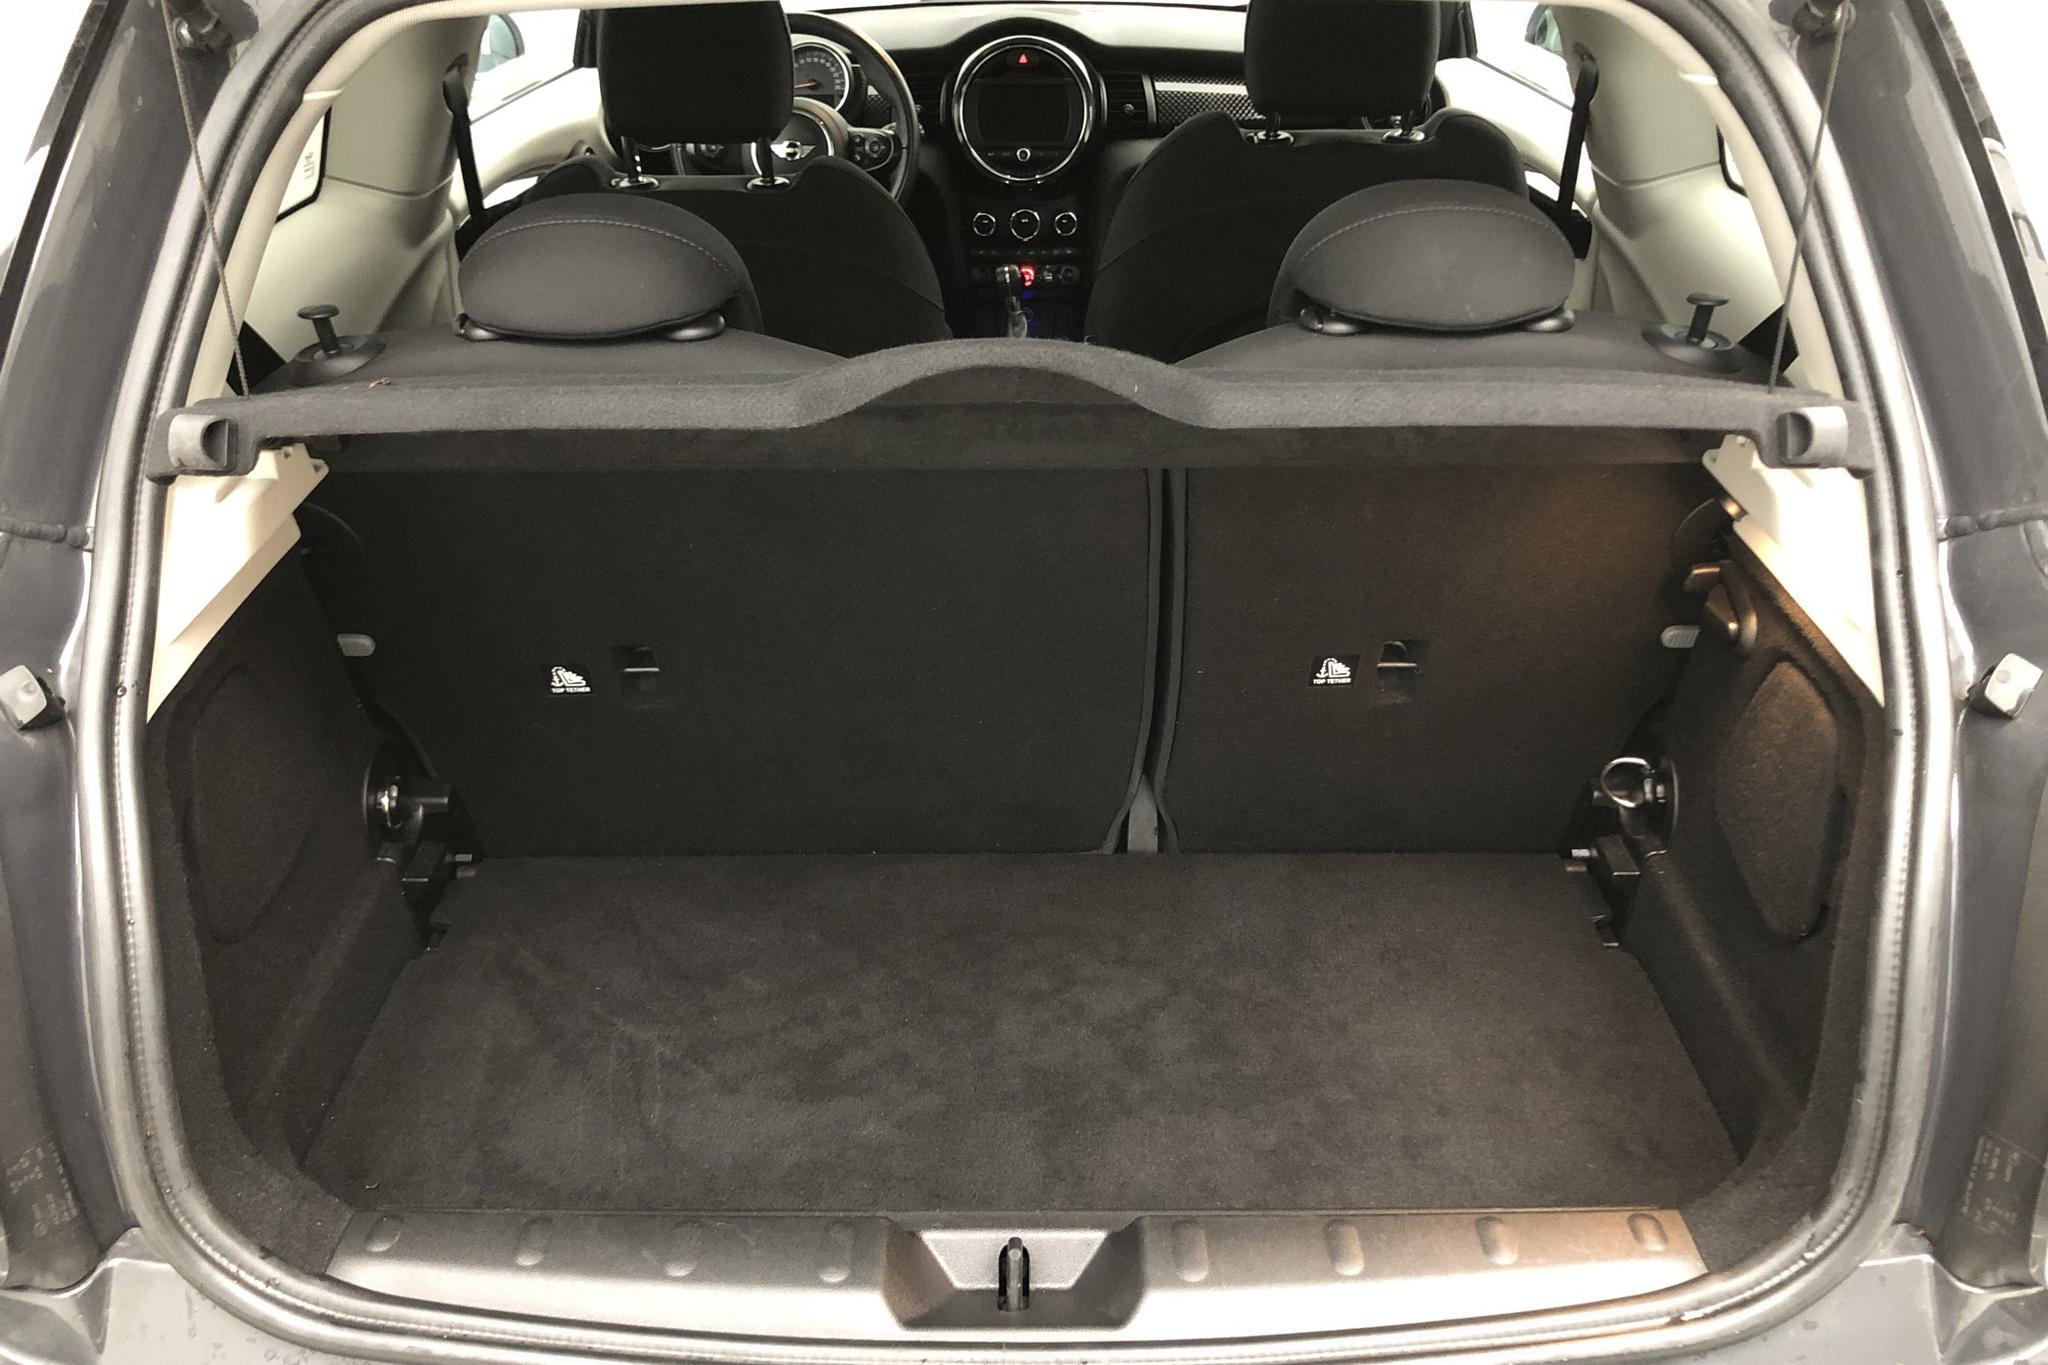 MINI Cooper S 3dr (192hk) - 15 000 km - Manual - gray - 2017